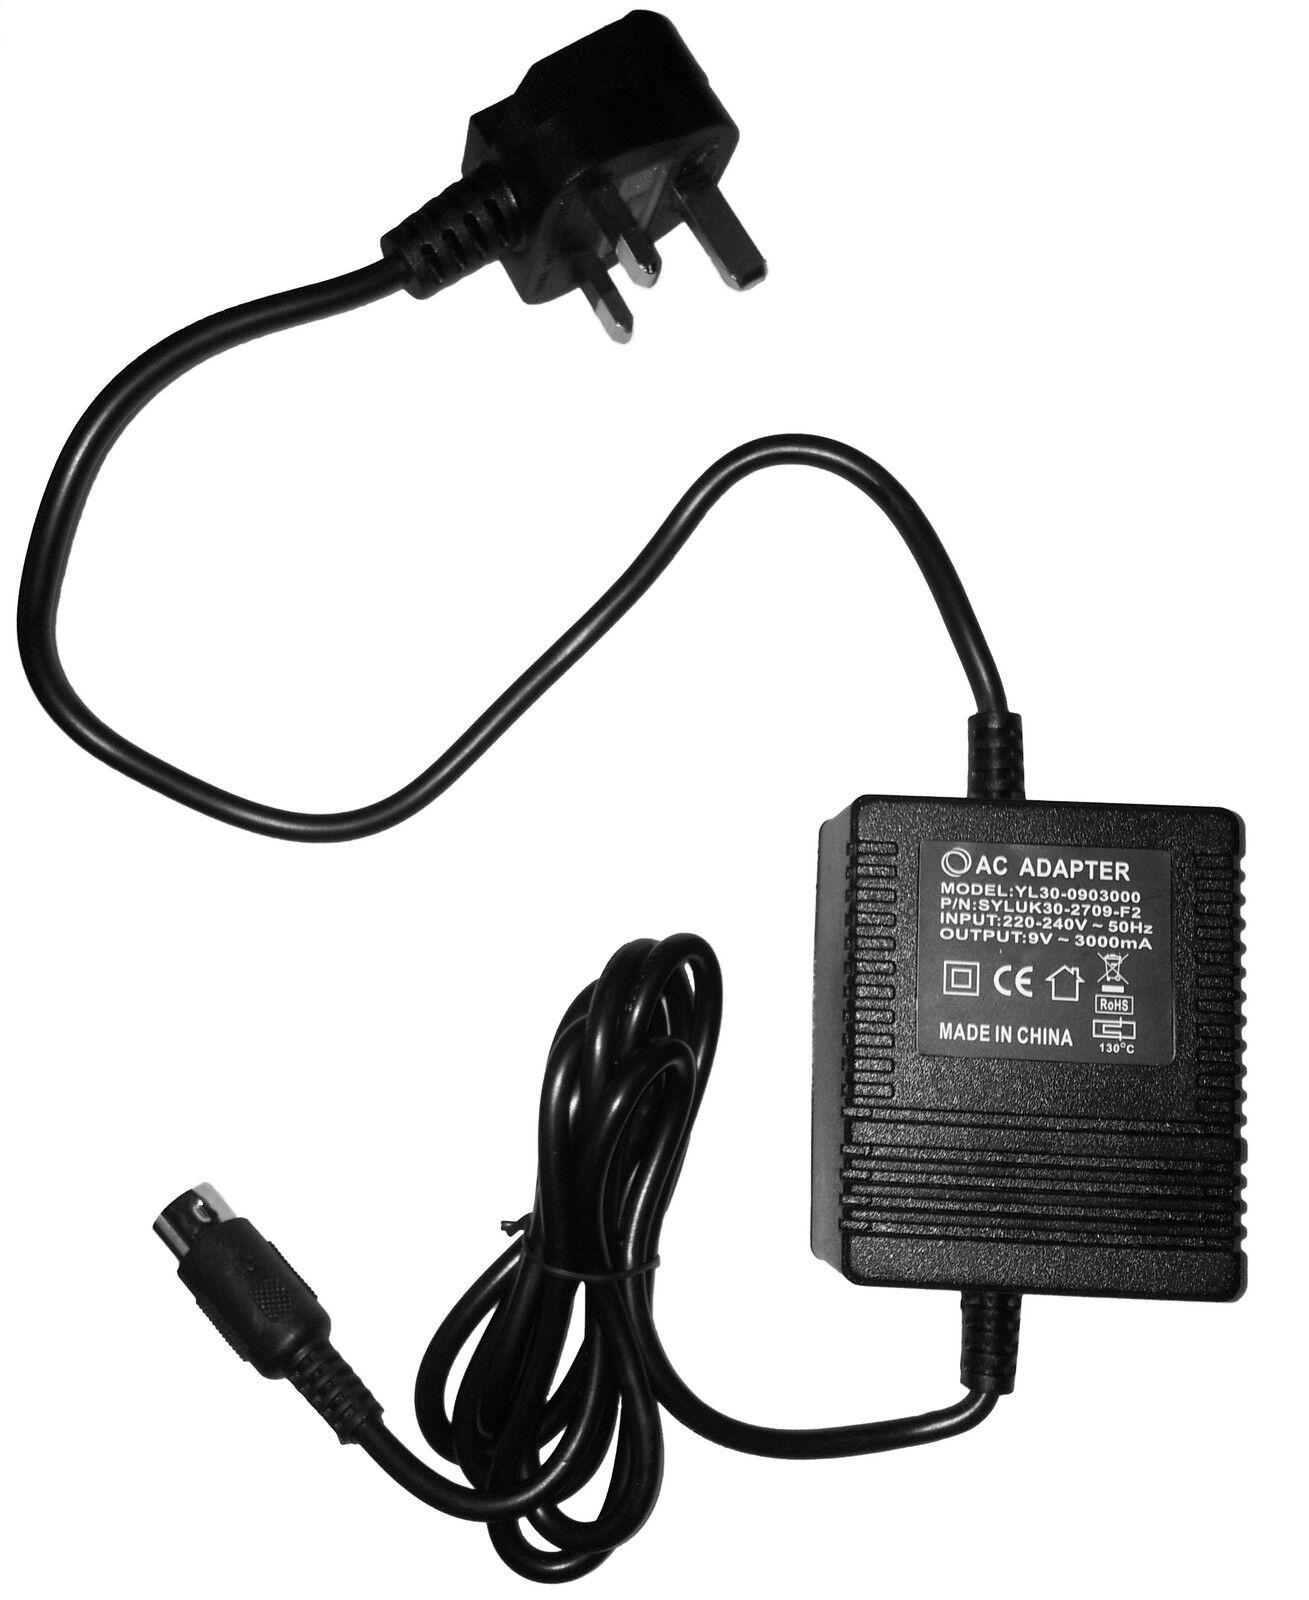 ROCKTRON UTOPIA G300 POWER SUPPLY REPLACEMENT ADAPTER UK 9V 220V 230V 240V